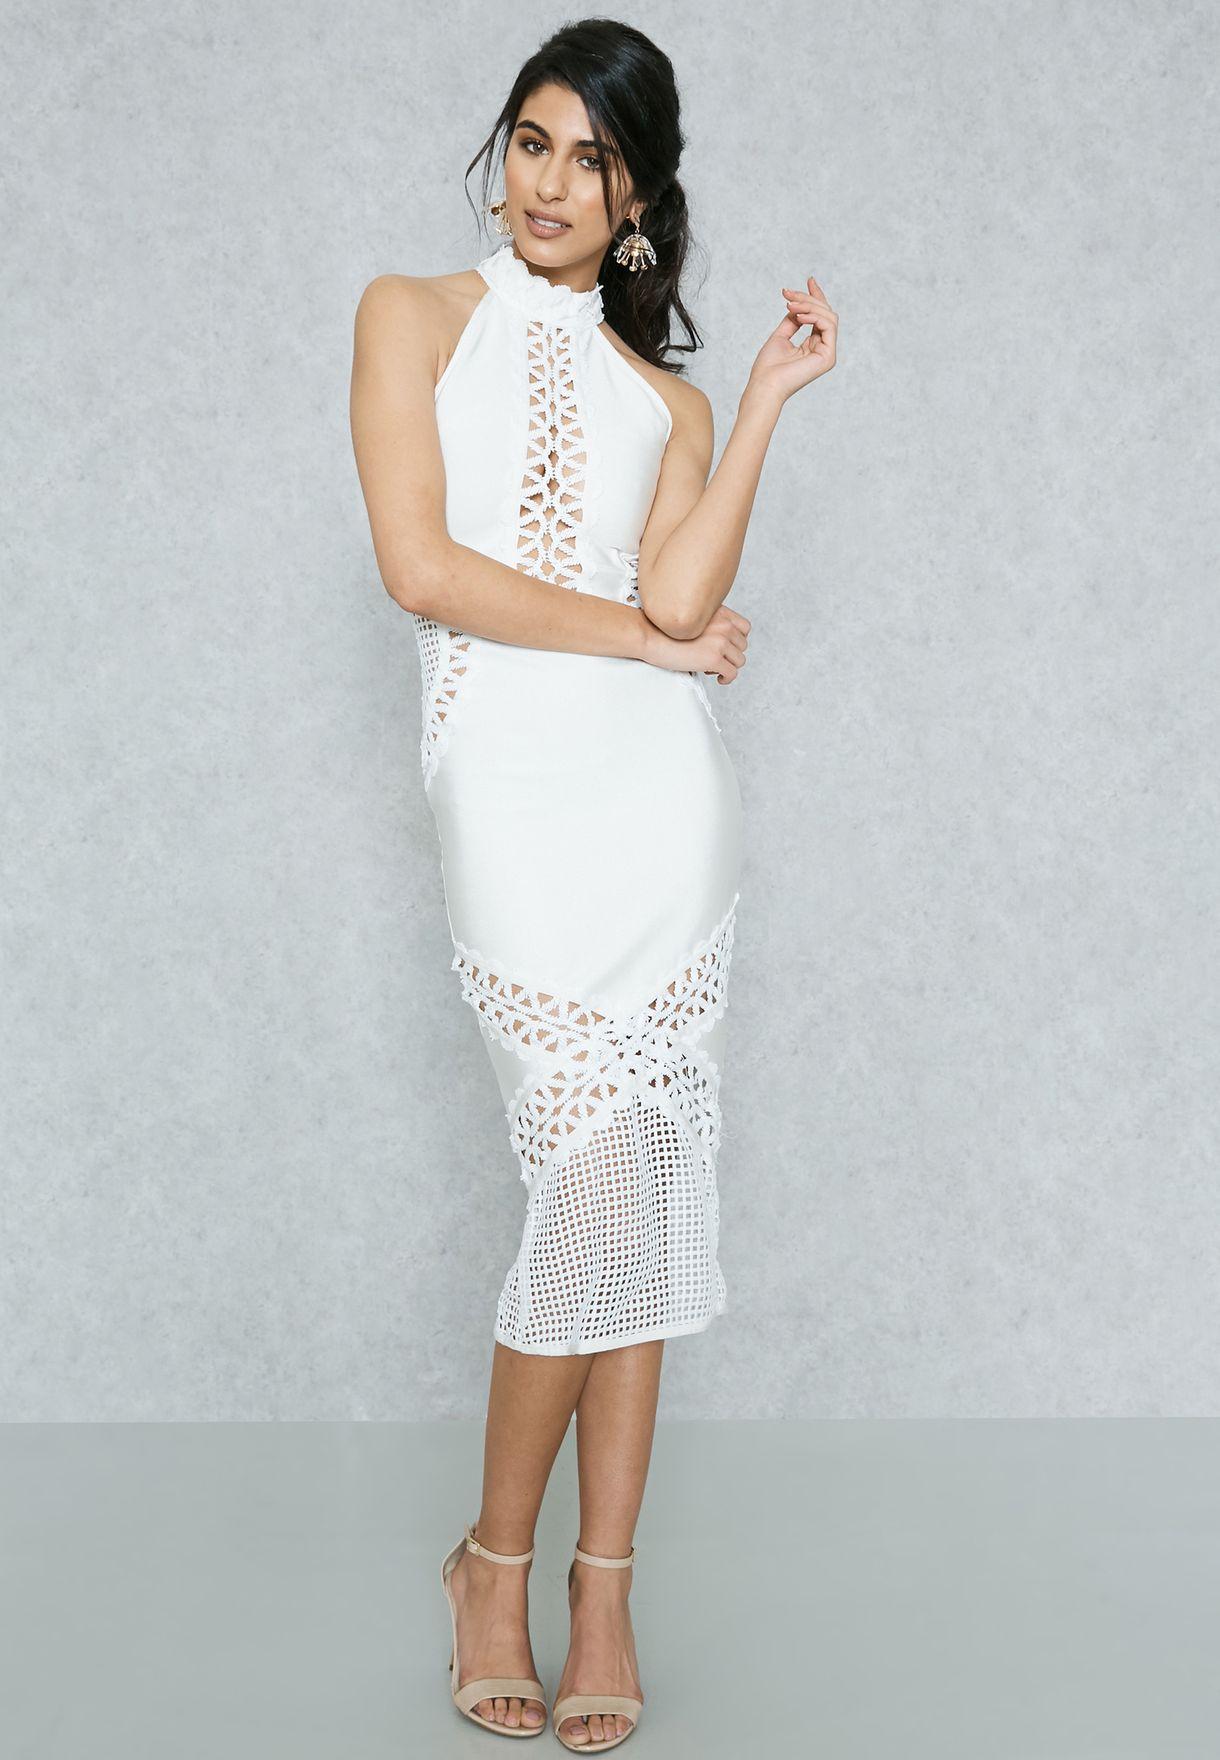 dd810b9b2e2c Shop Missguided white High Neck Lace Bodycon Dress DE911121 for ...